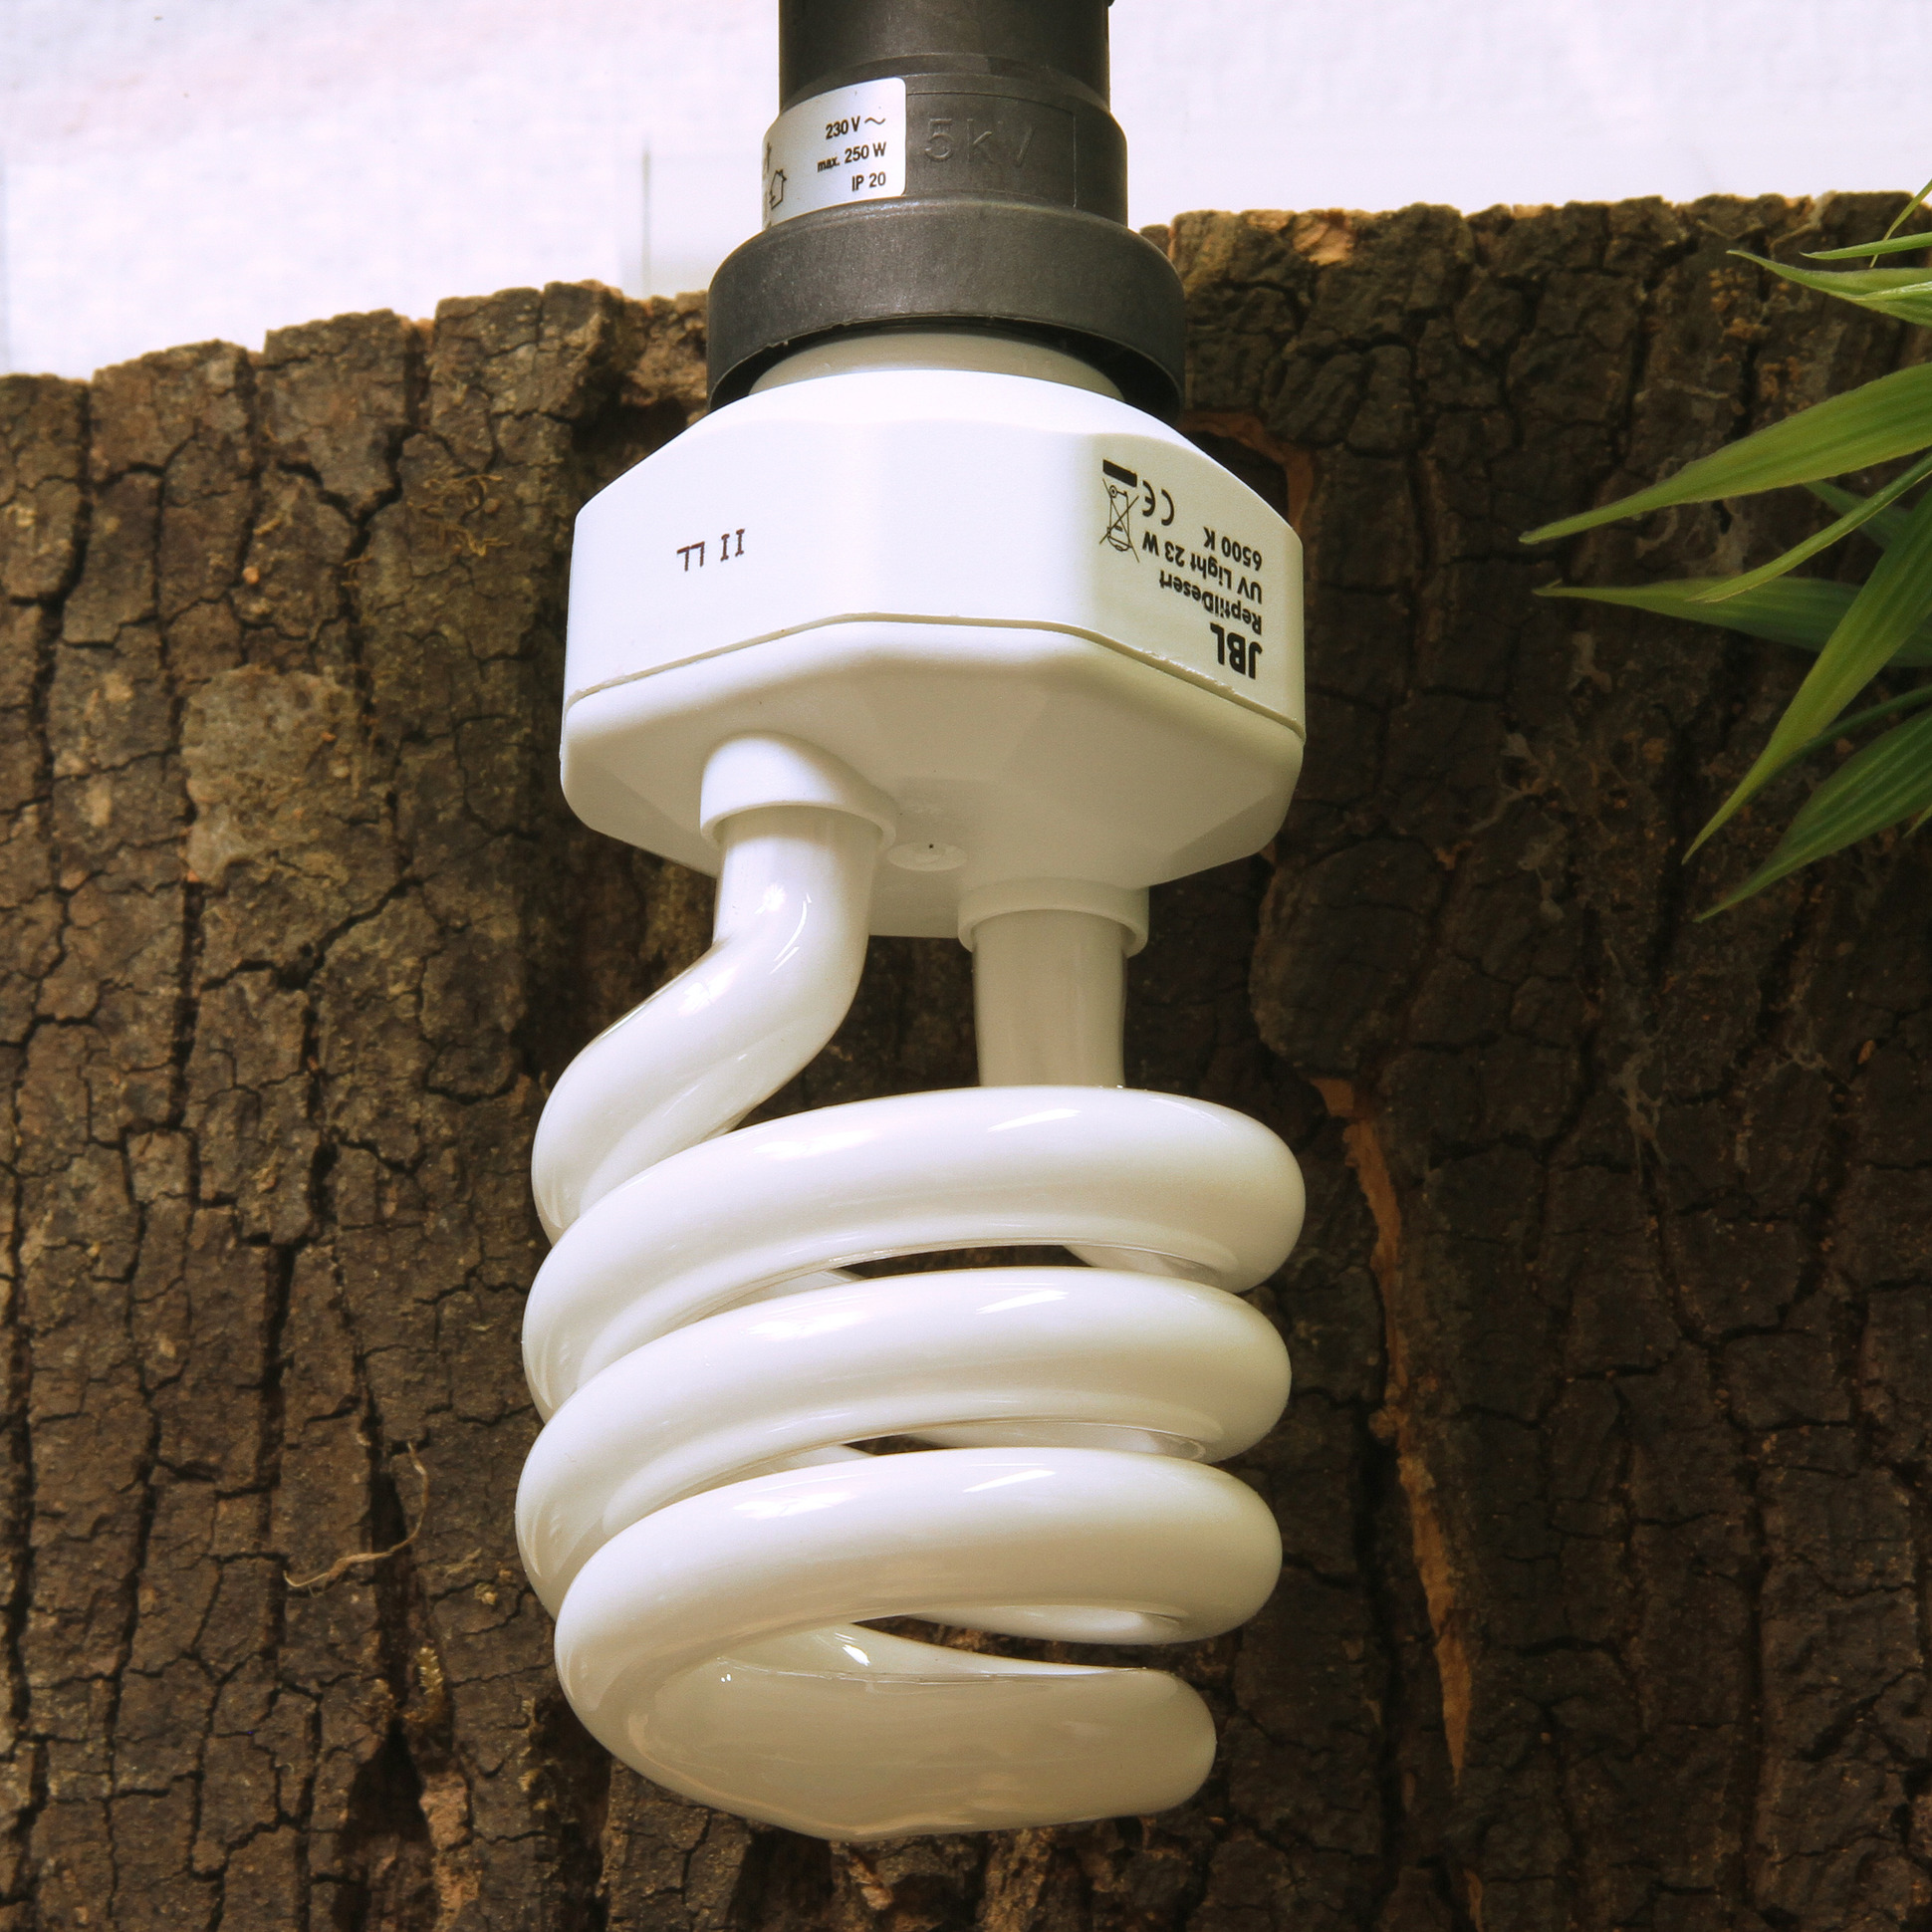 Jbl Reptildesert Uv Light Fluorescent Bulbs Diagram Lamp Eurolite 23w Has A Img Src Images Container W137 H137 65125 Alt